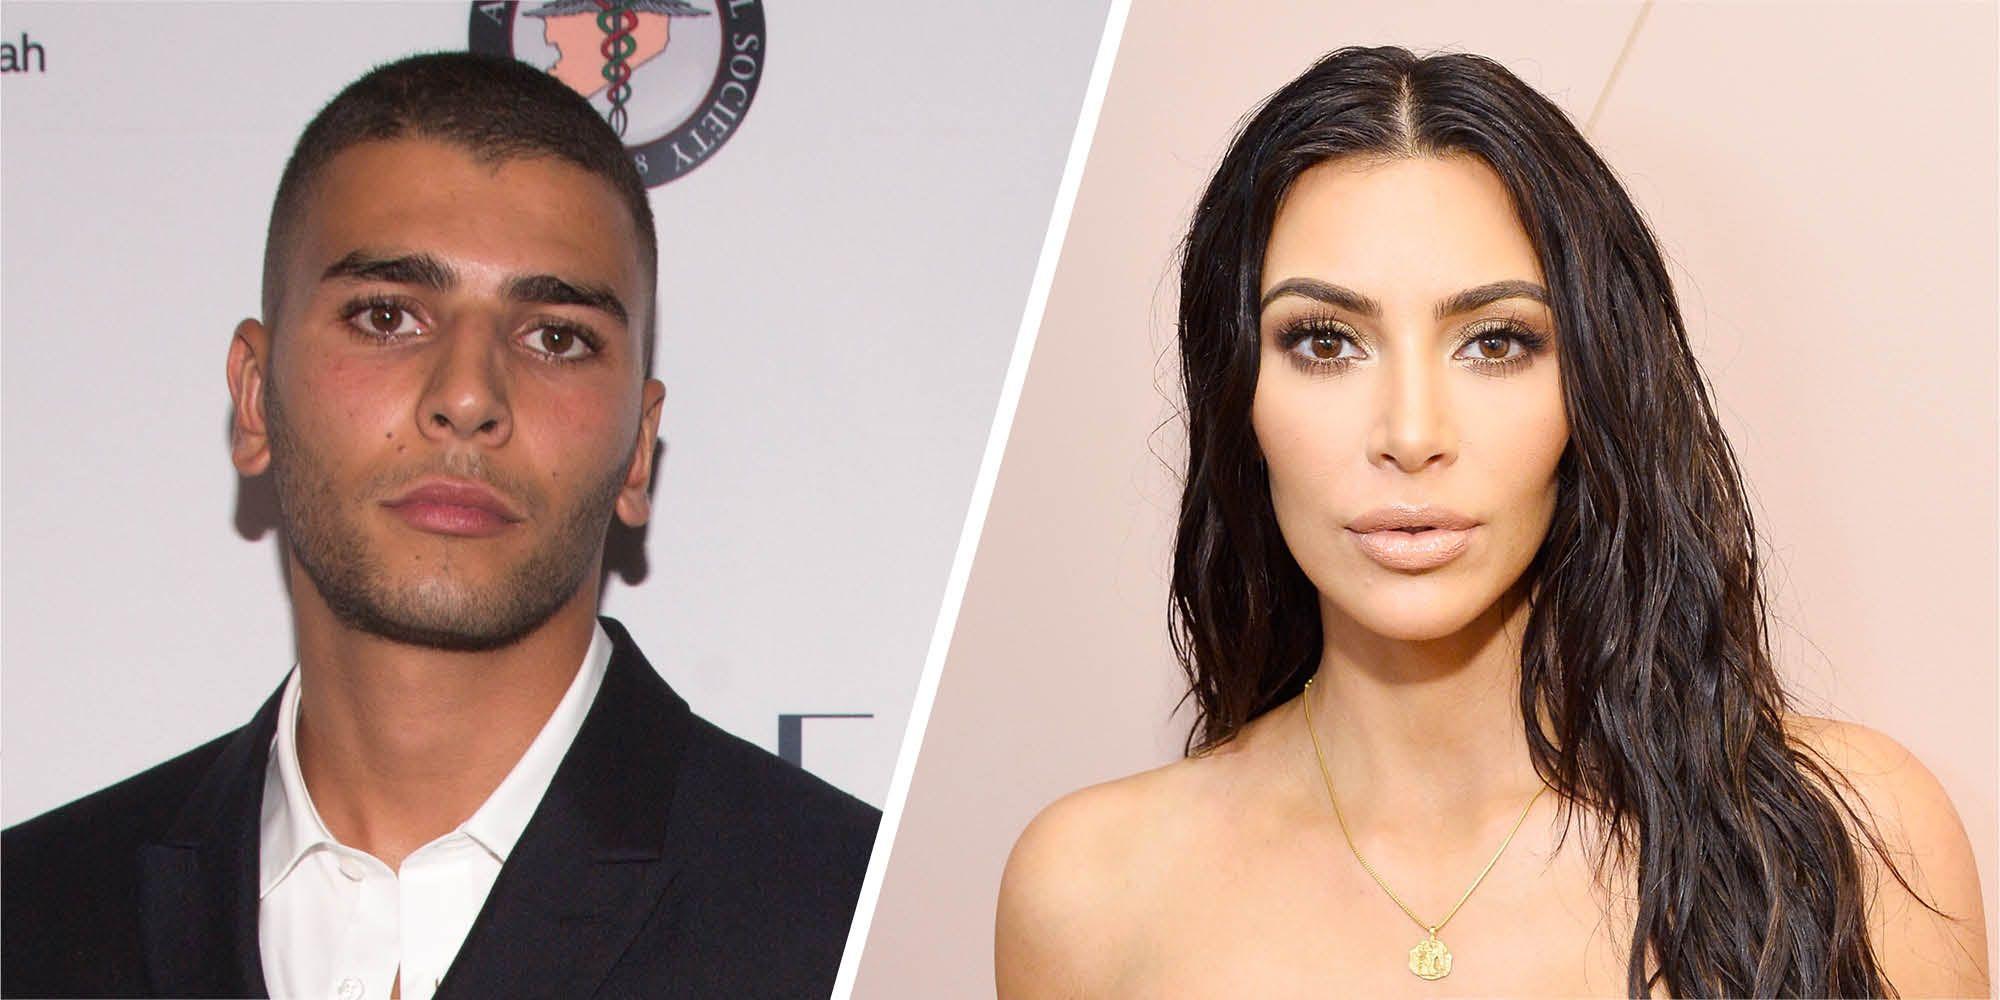 Now Kim Kardashian is shading Younes Bendjima on Instagram